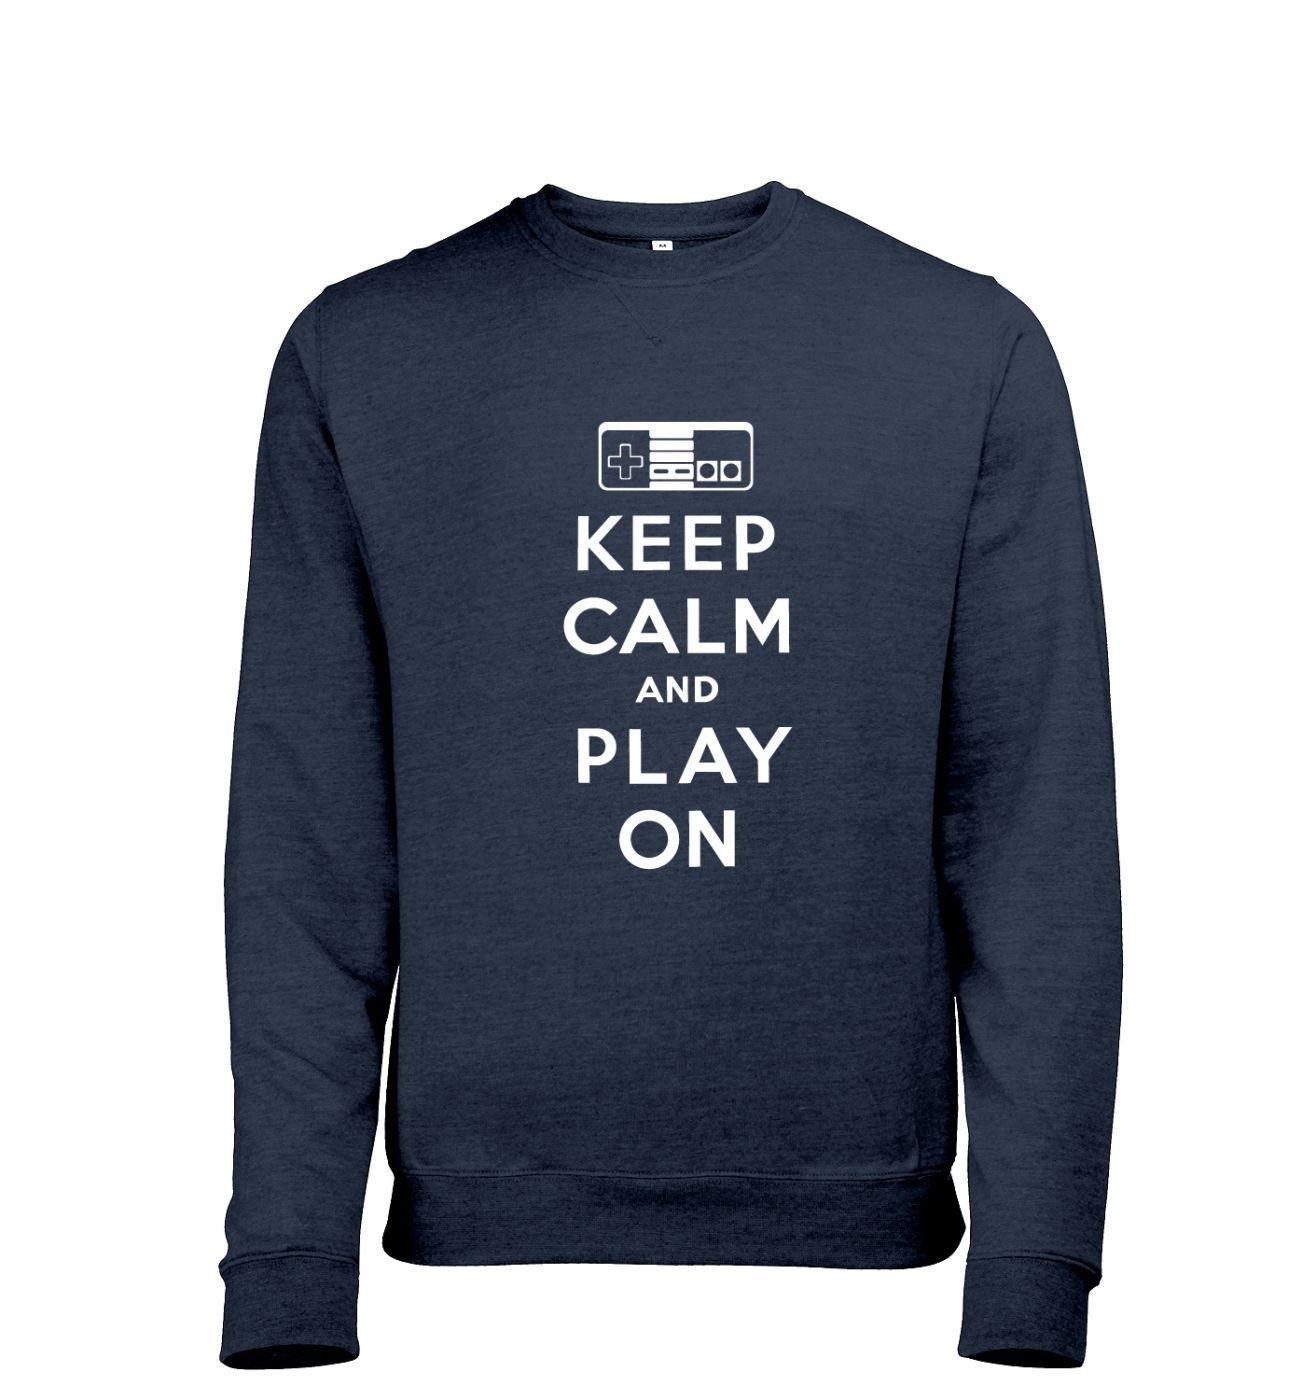 Keep Calm And Play On men's heather sweatshirt